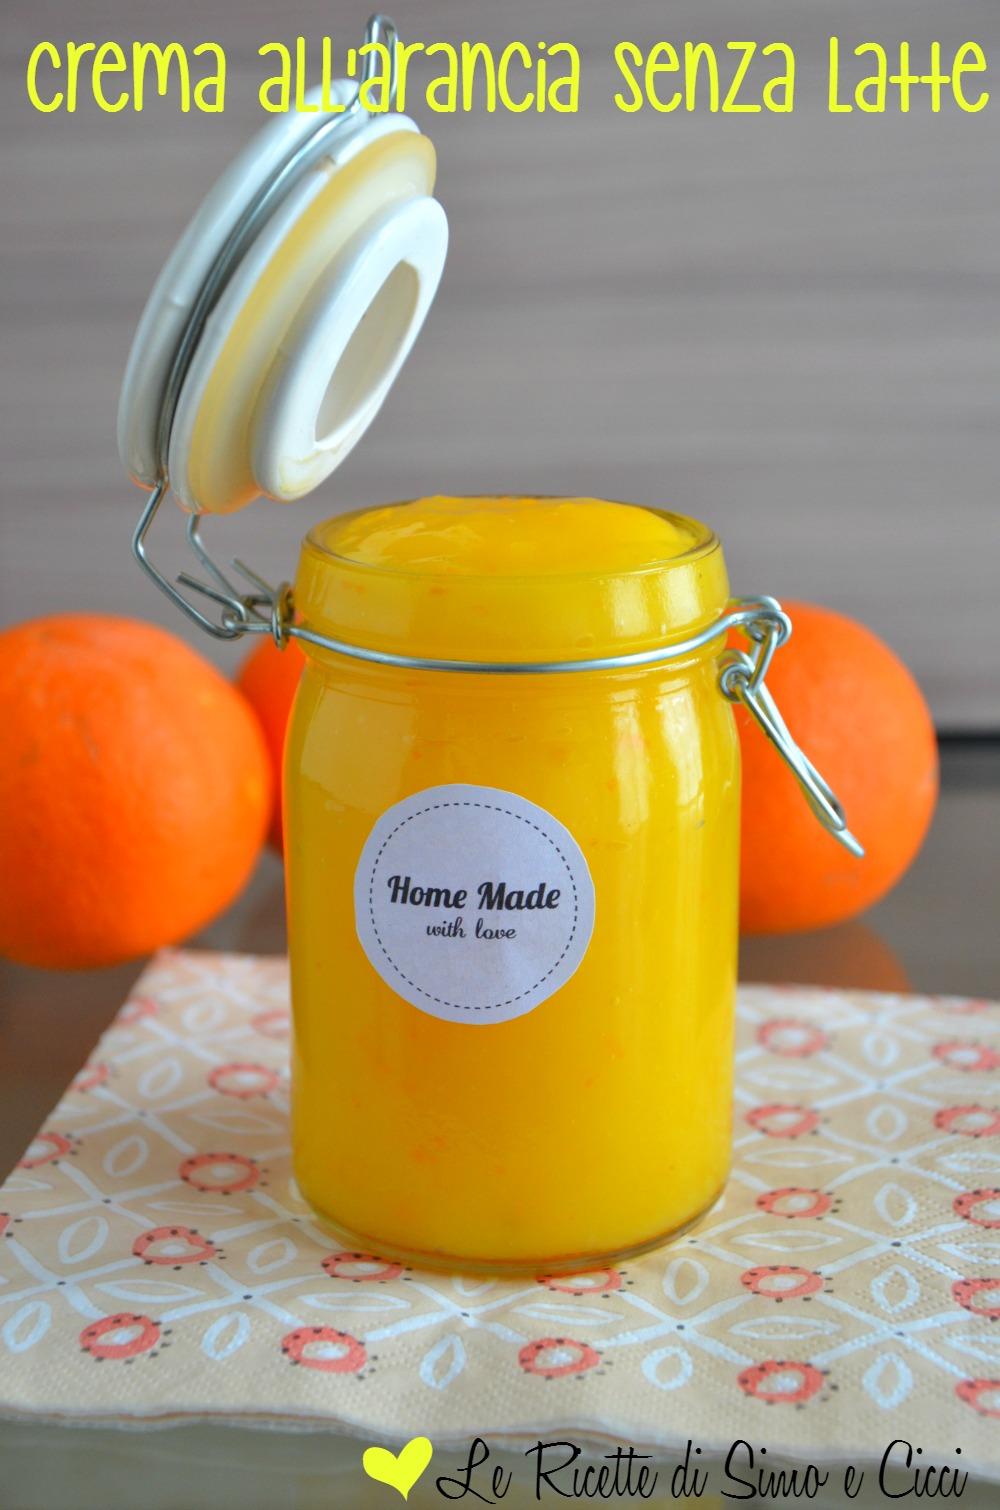 Crema all'arancia senza latte